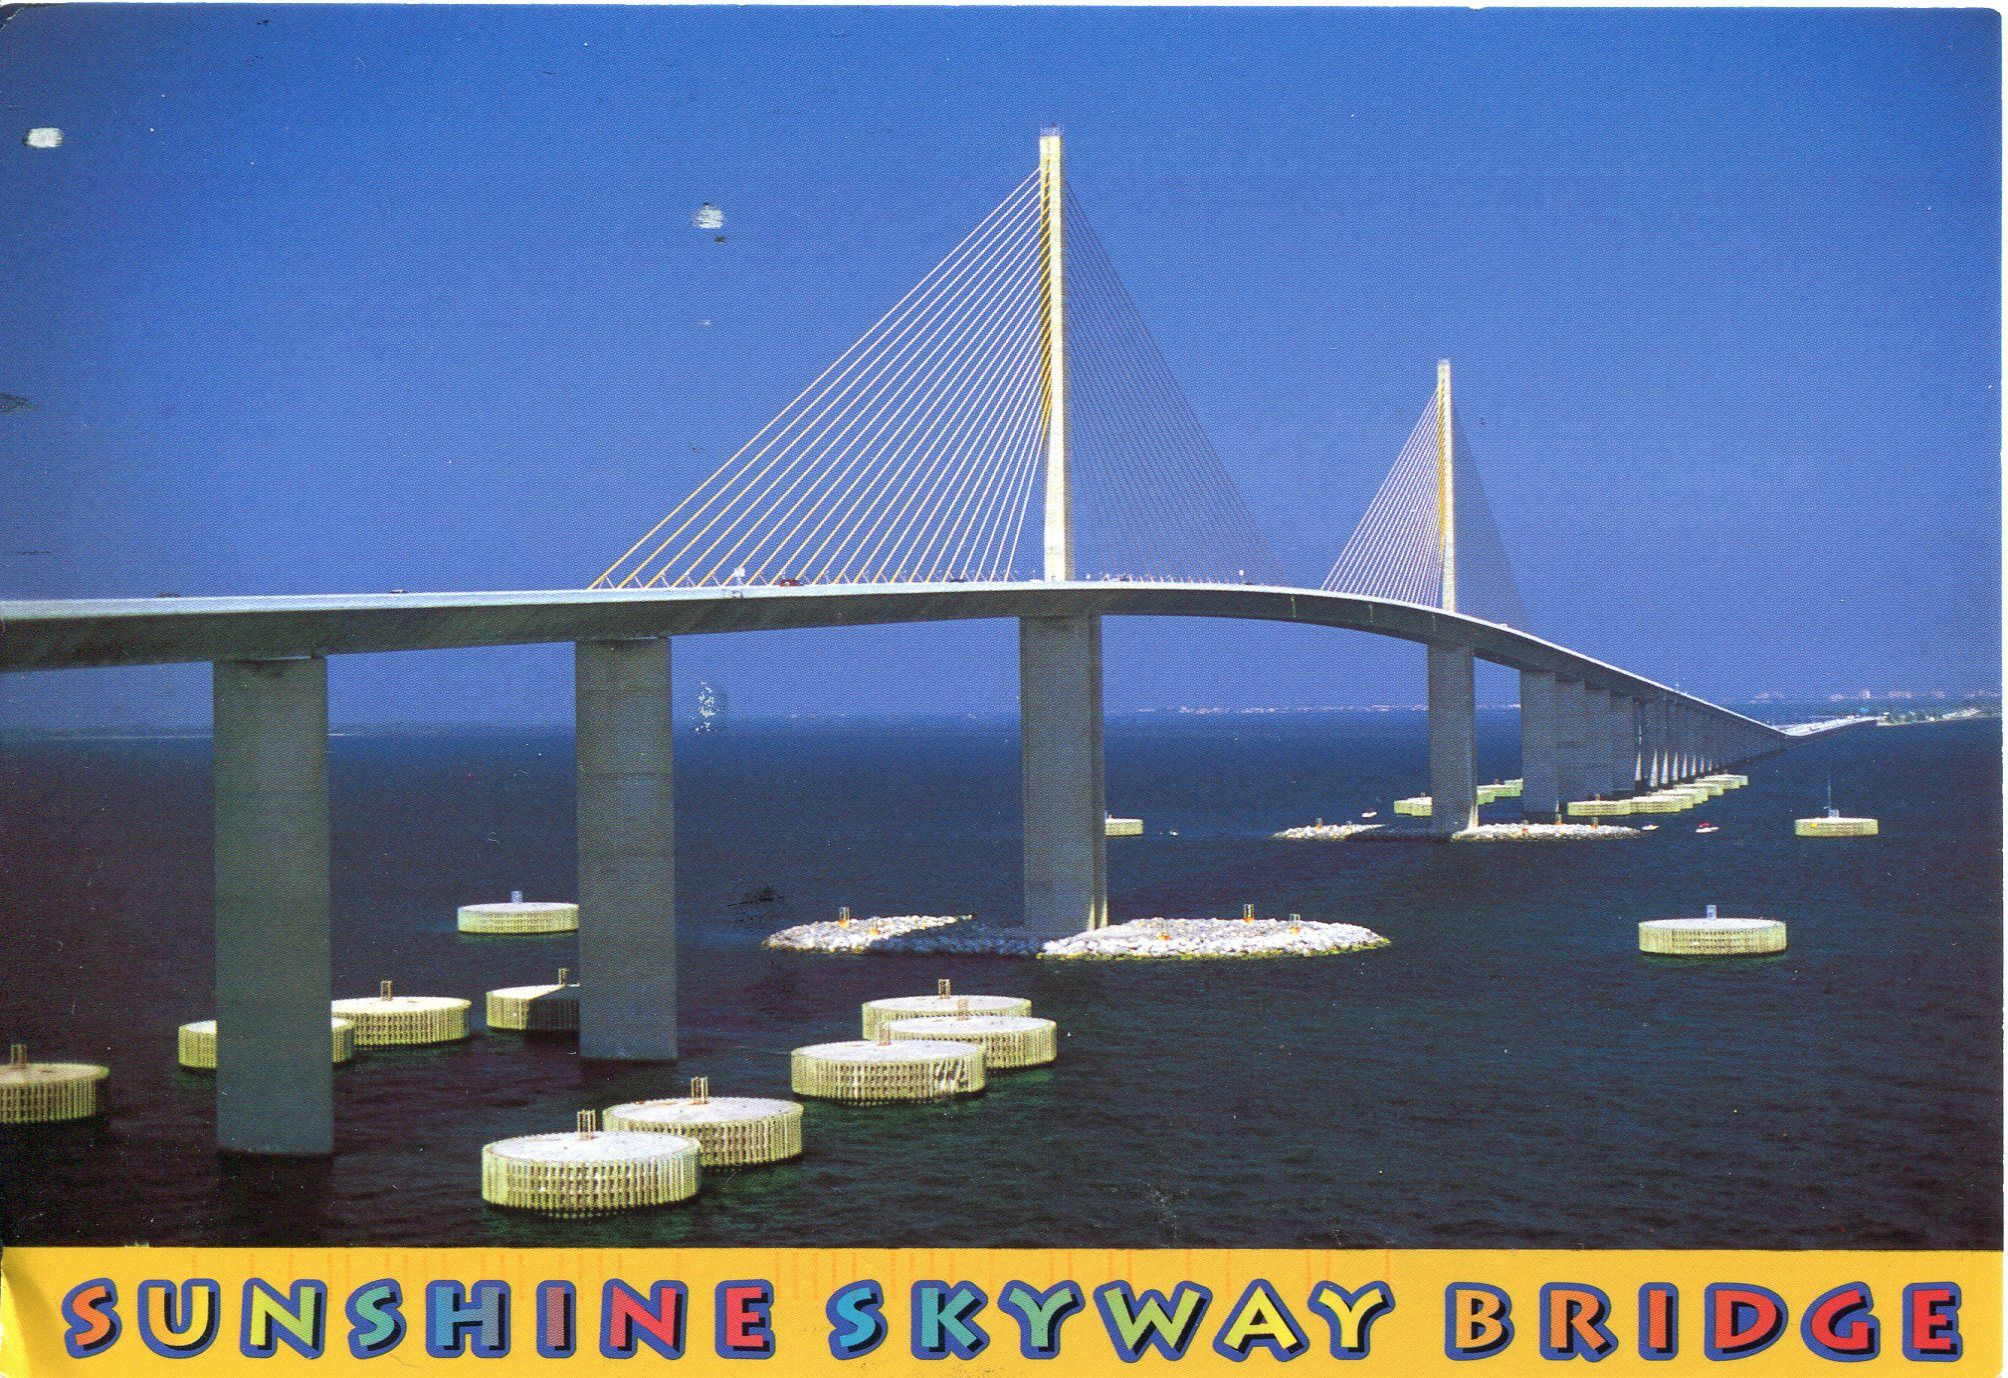 Sunshine Skyway Bridge Sunshine skyway bridge, Adventure